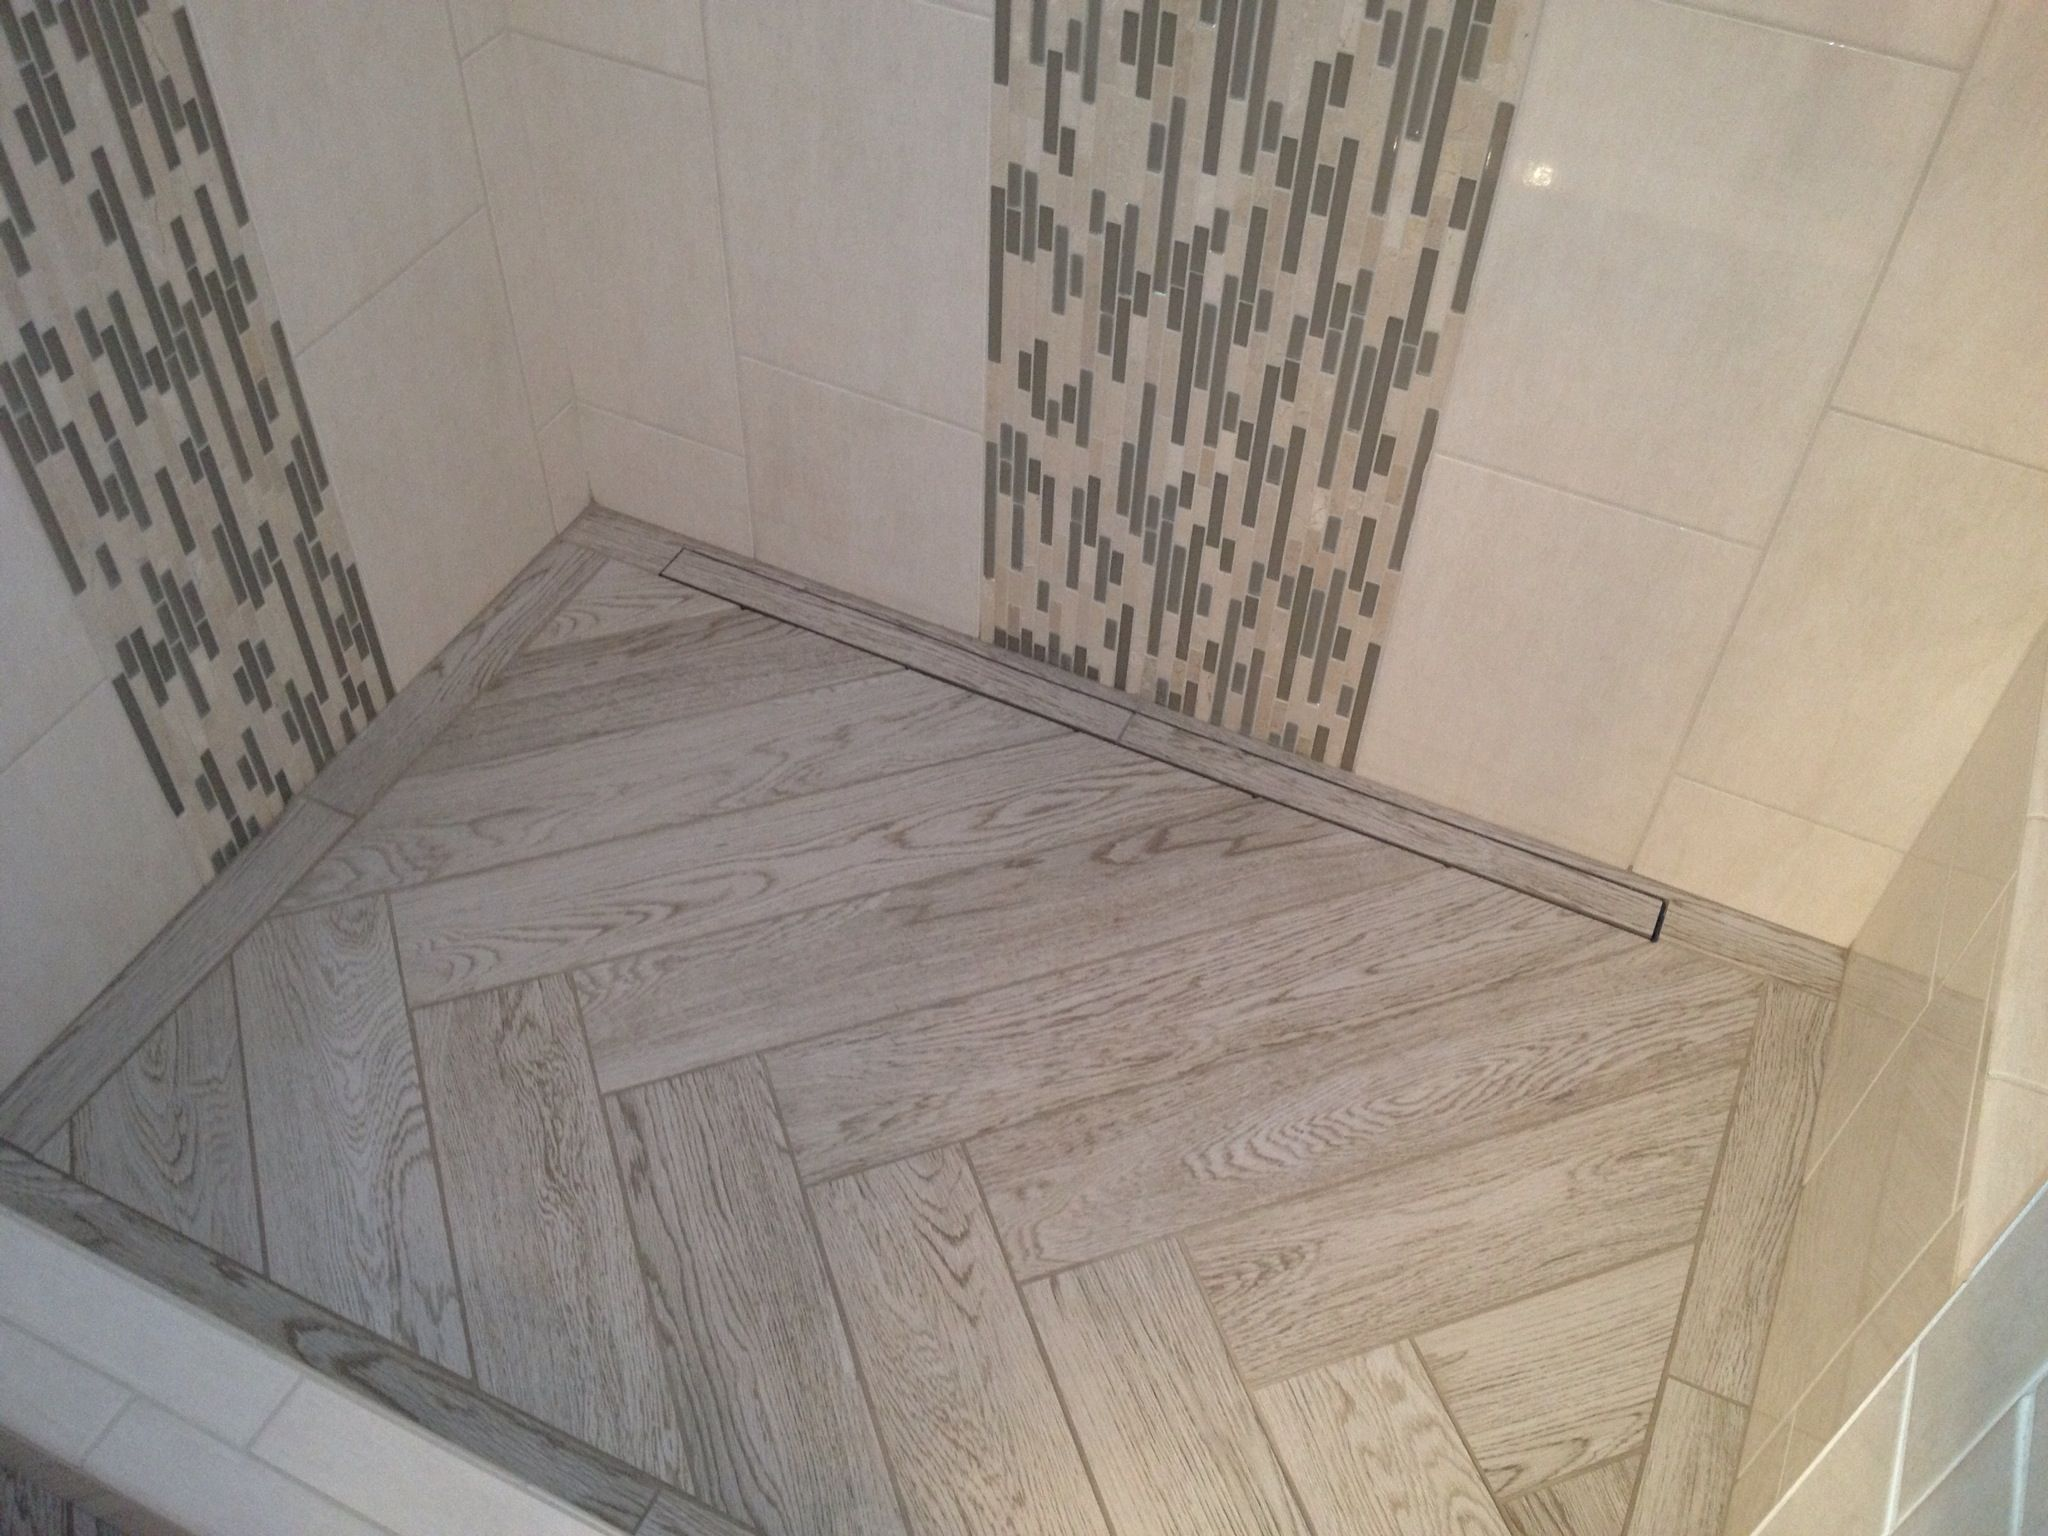 interceramic 39 s scenic in a herringbone pattern on a shower. Black Bedroom Furniture Sets. Home Design Ideas